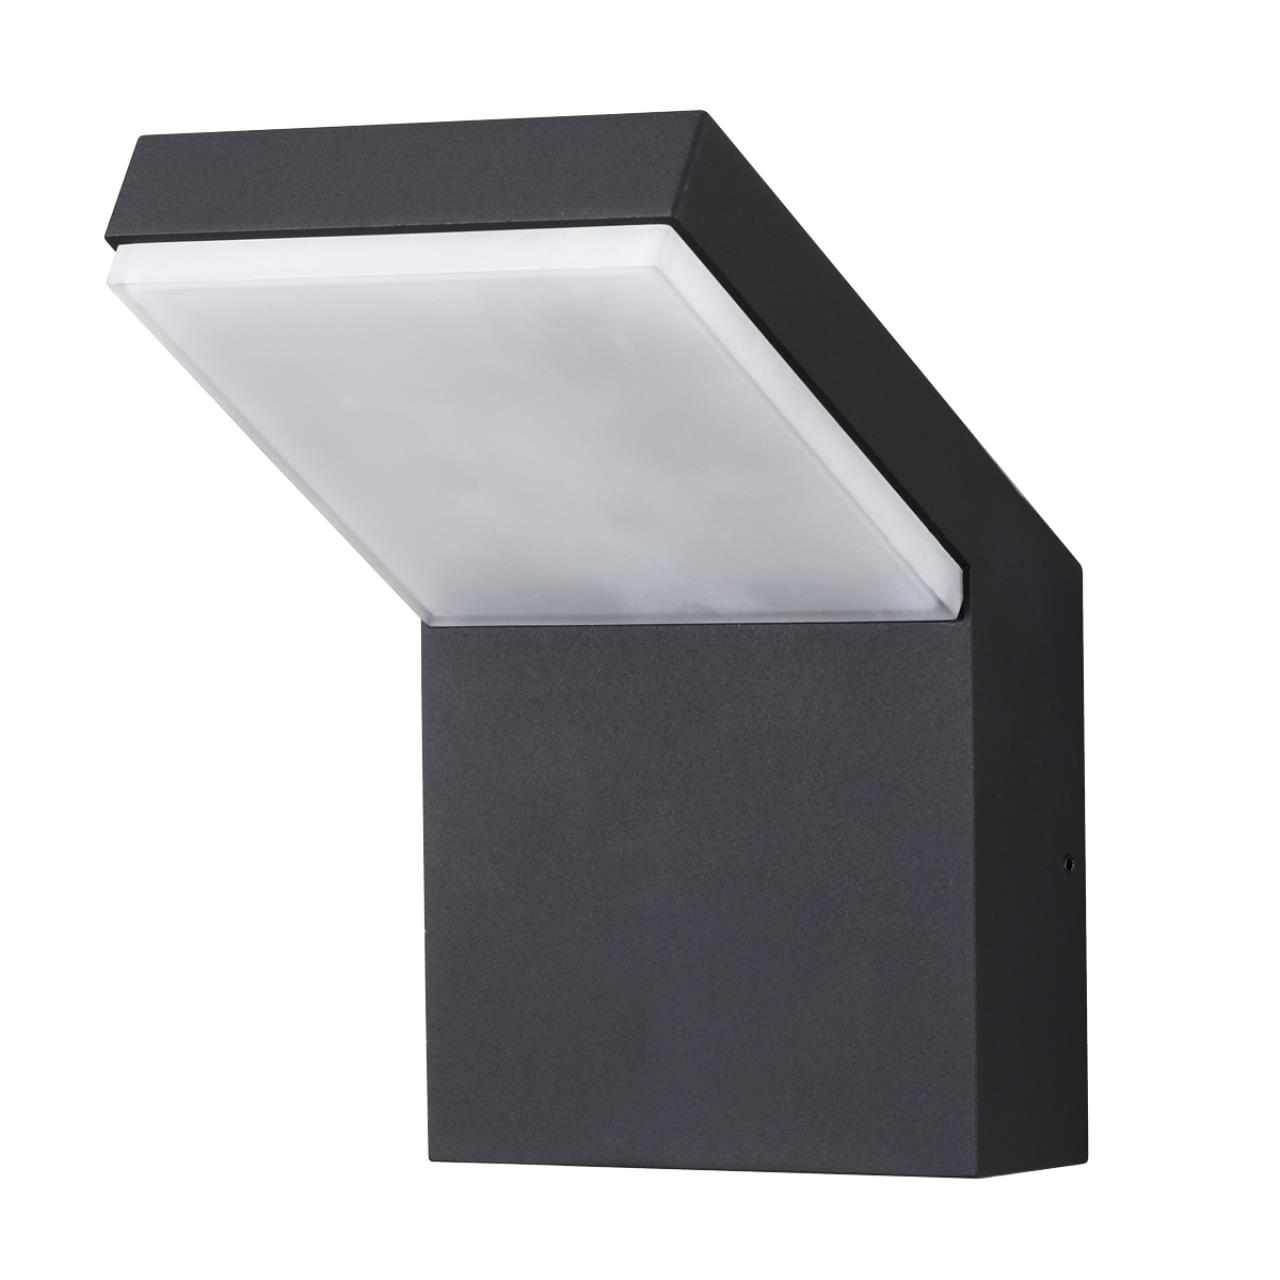 357520 STREET NT18 150 темно-серый Ландшафтный светильник IP65 LED 3000K 20W 100-240V ROCA